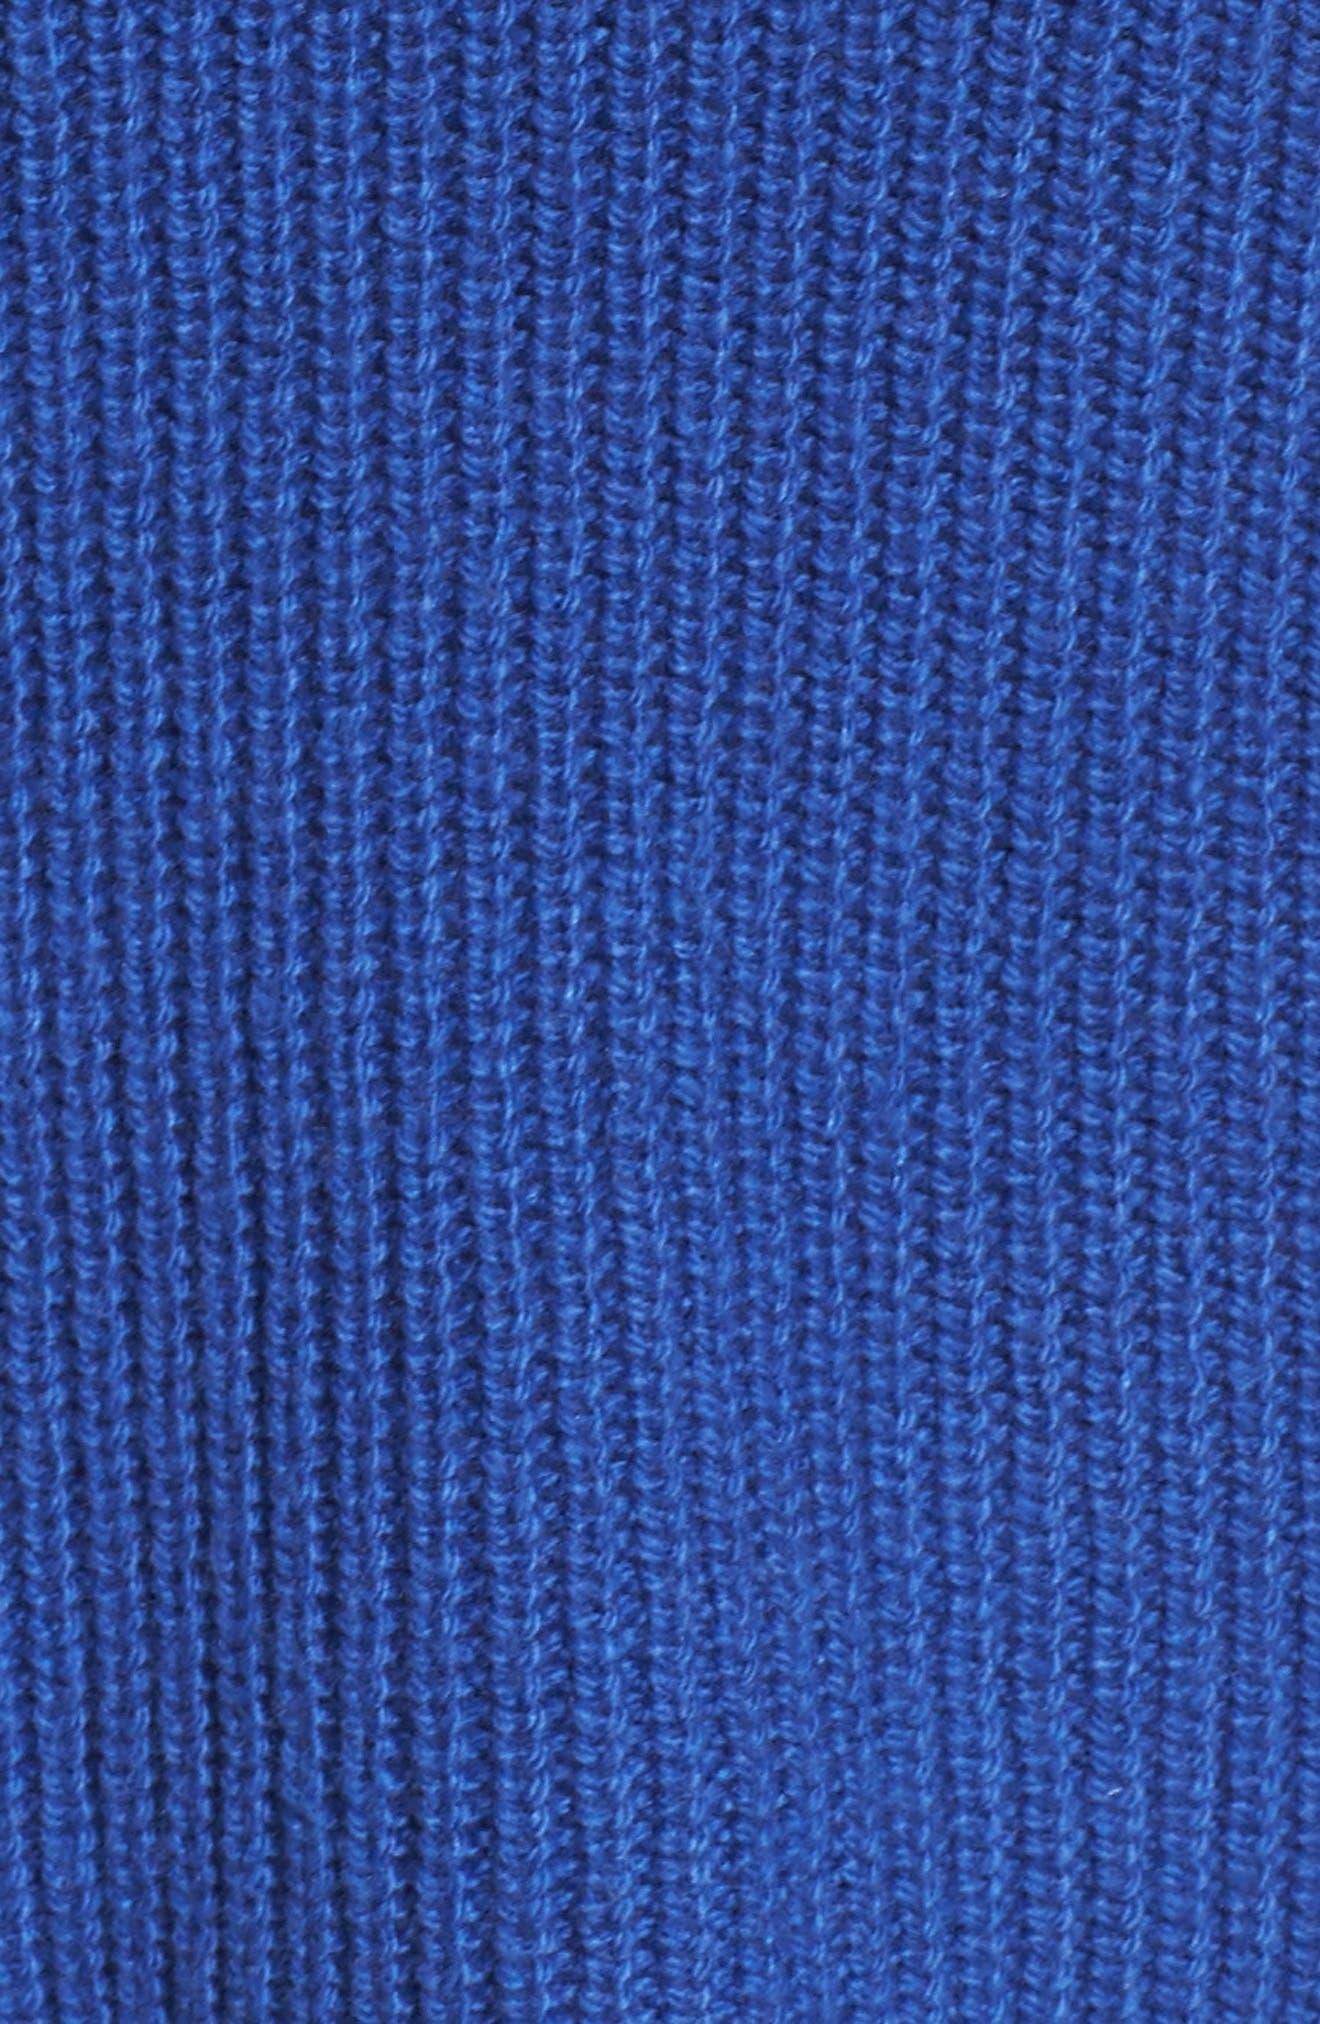 Shaker Stitch Sweater,                             Alternate thumbnail 5, color,                             401